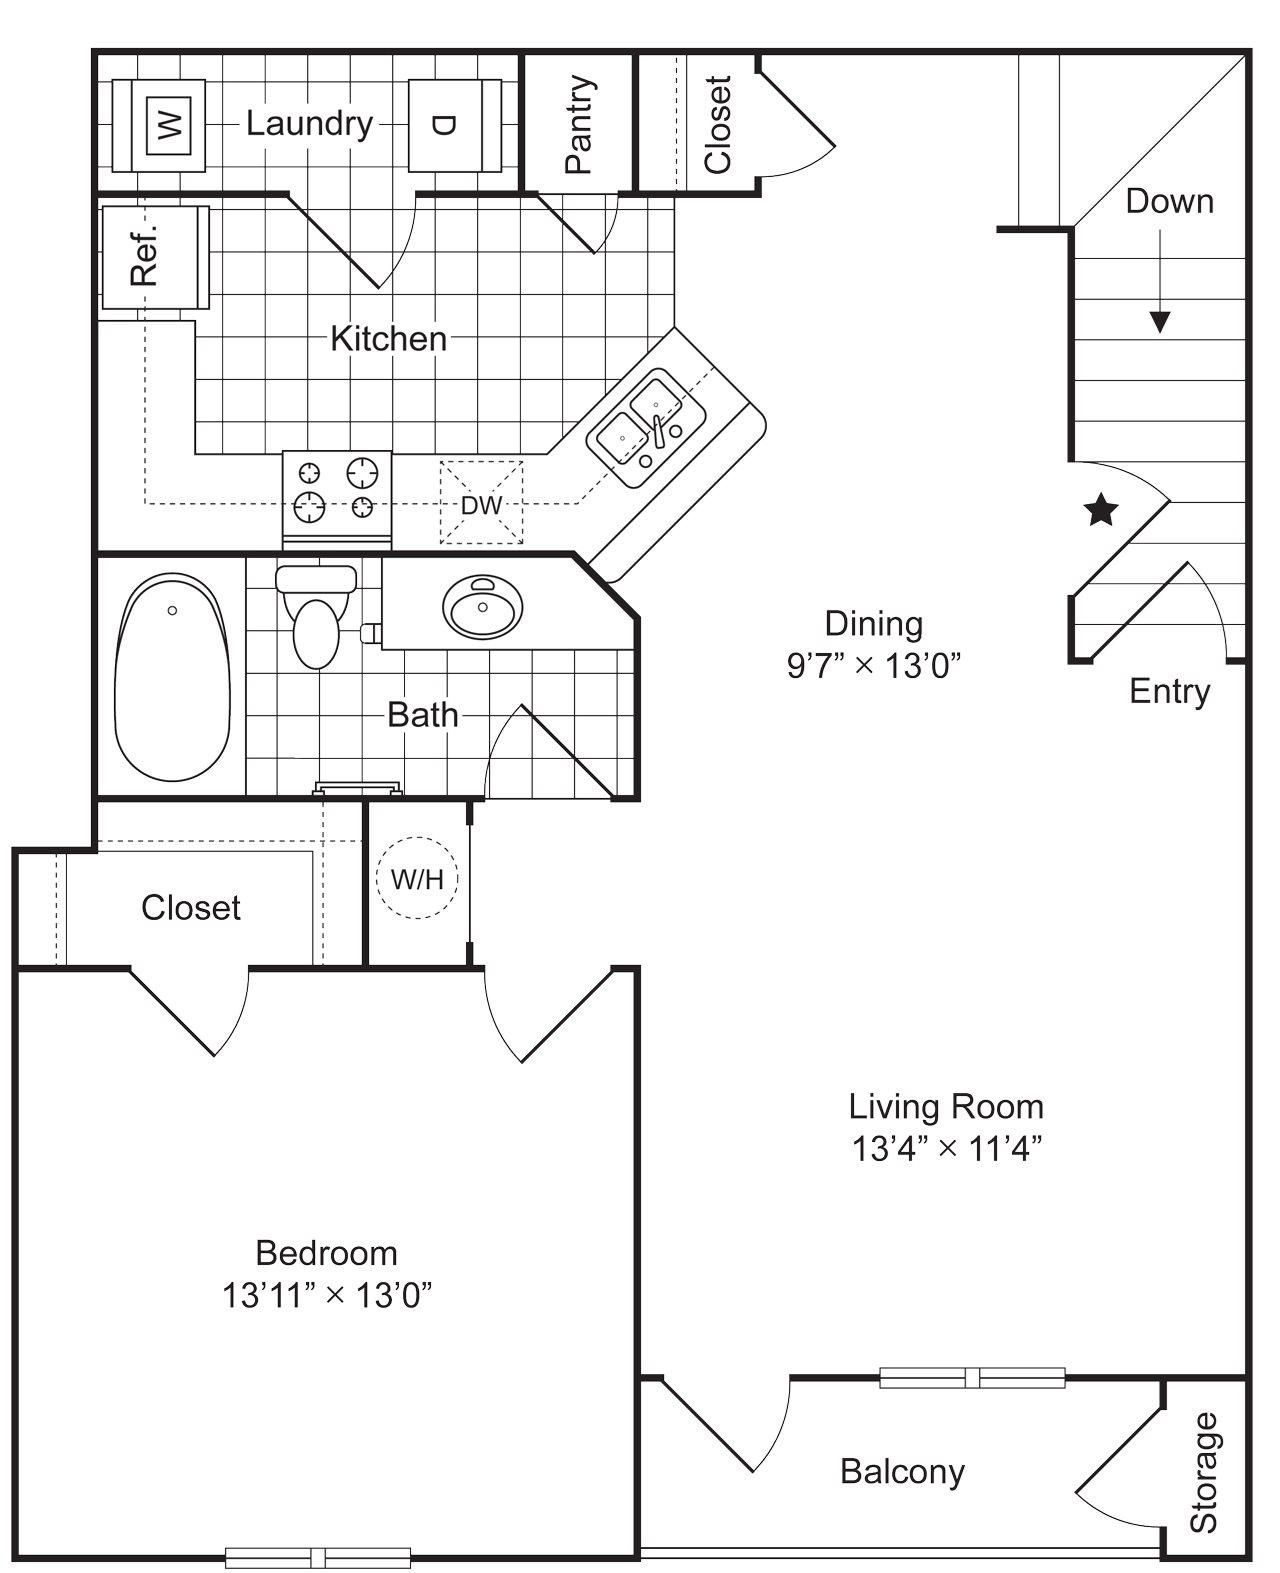 1 Bedroom 1 Bath 976 sqft (A2) Floor Plan 3